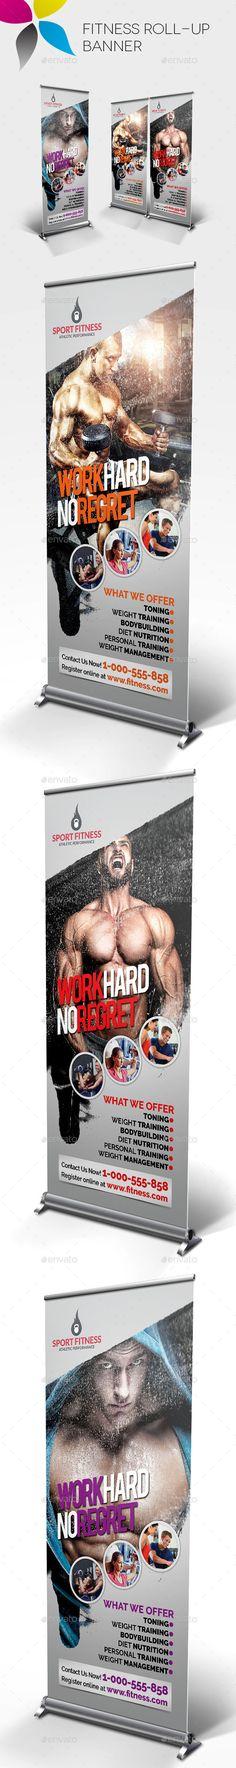 Fitness Roll-Up Banner Template #design Download: http://graphicriver.net/item/fitness-rollup-banner/12252736?ref=ksioks